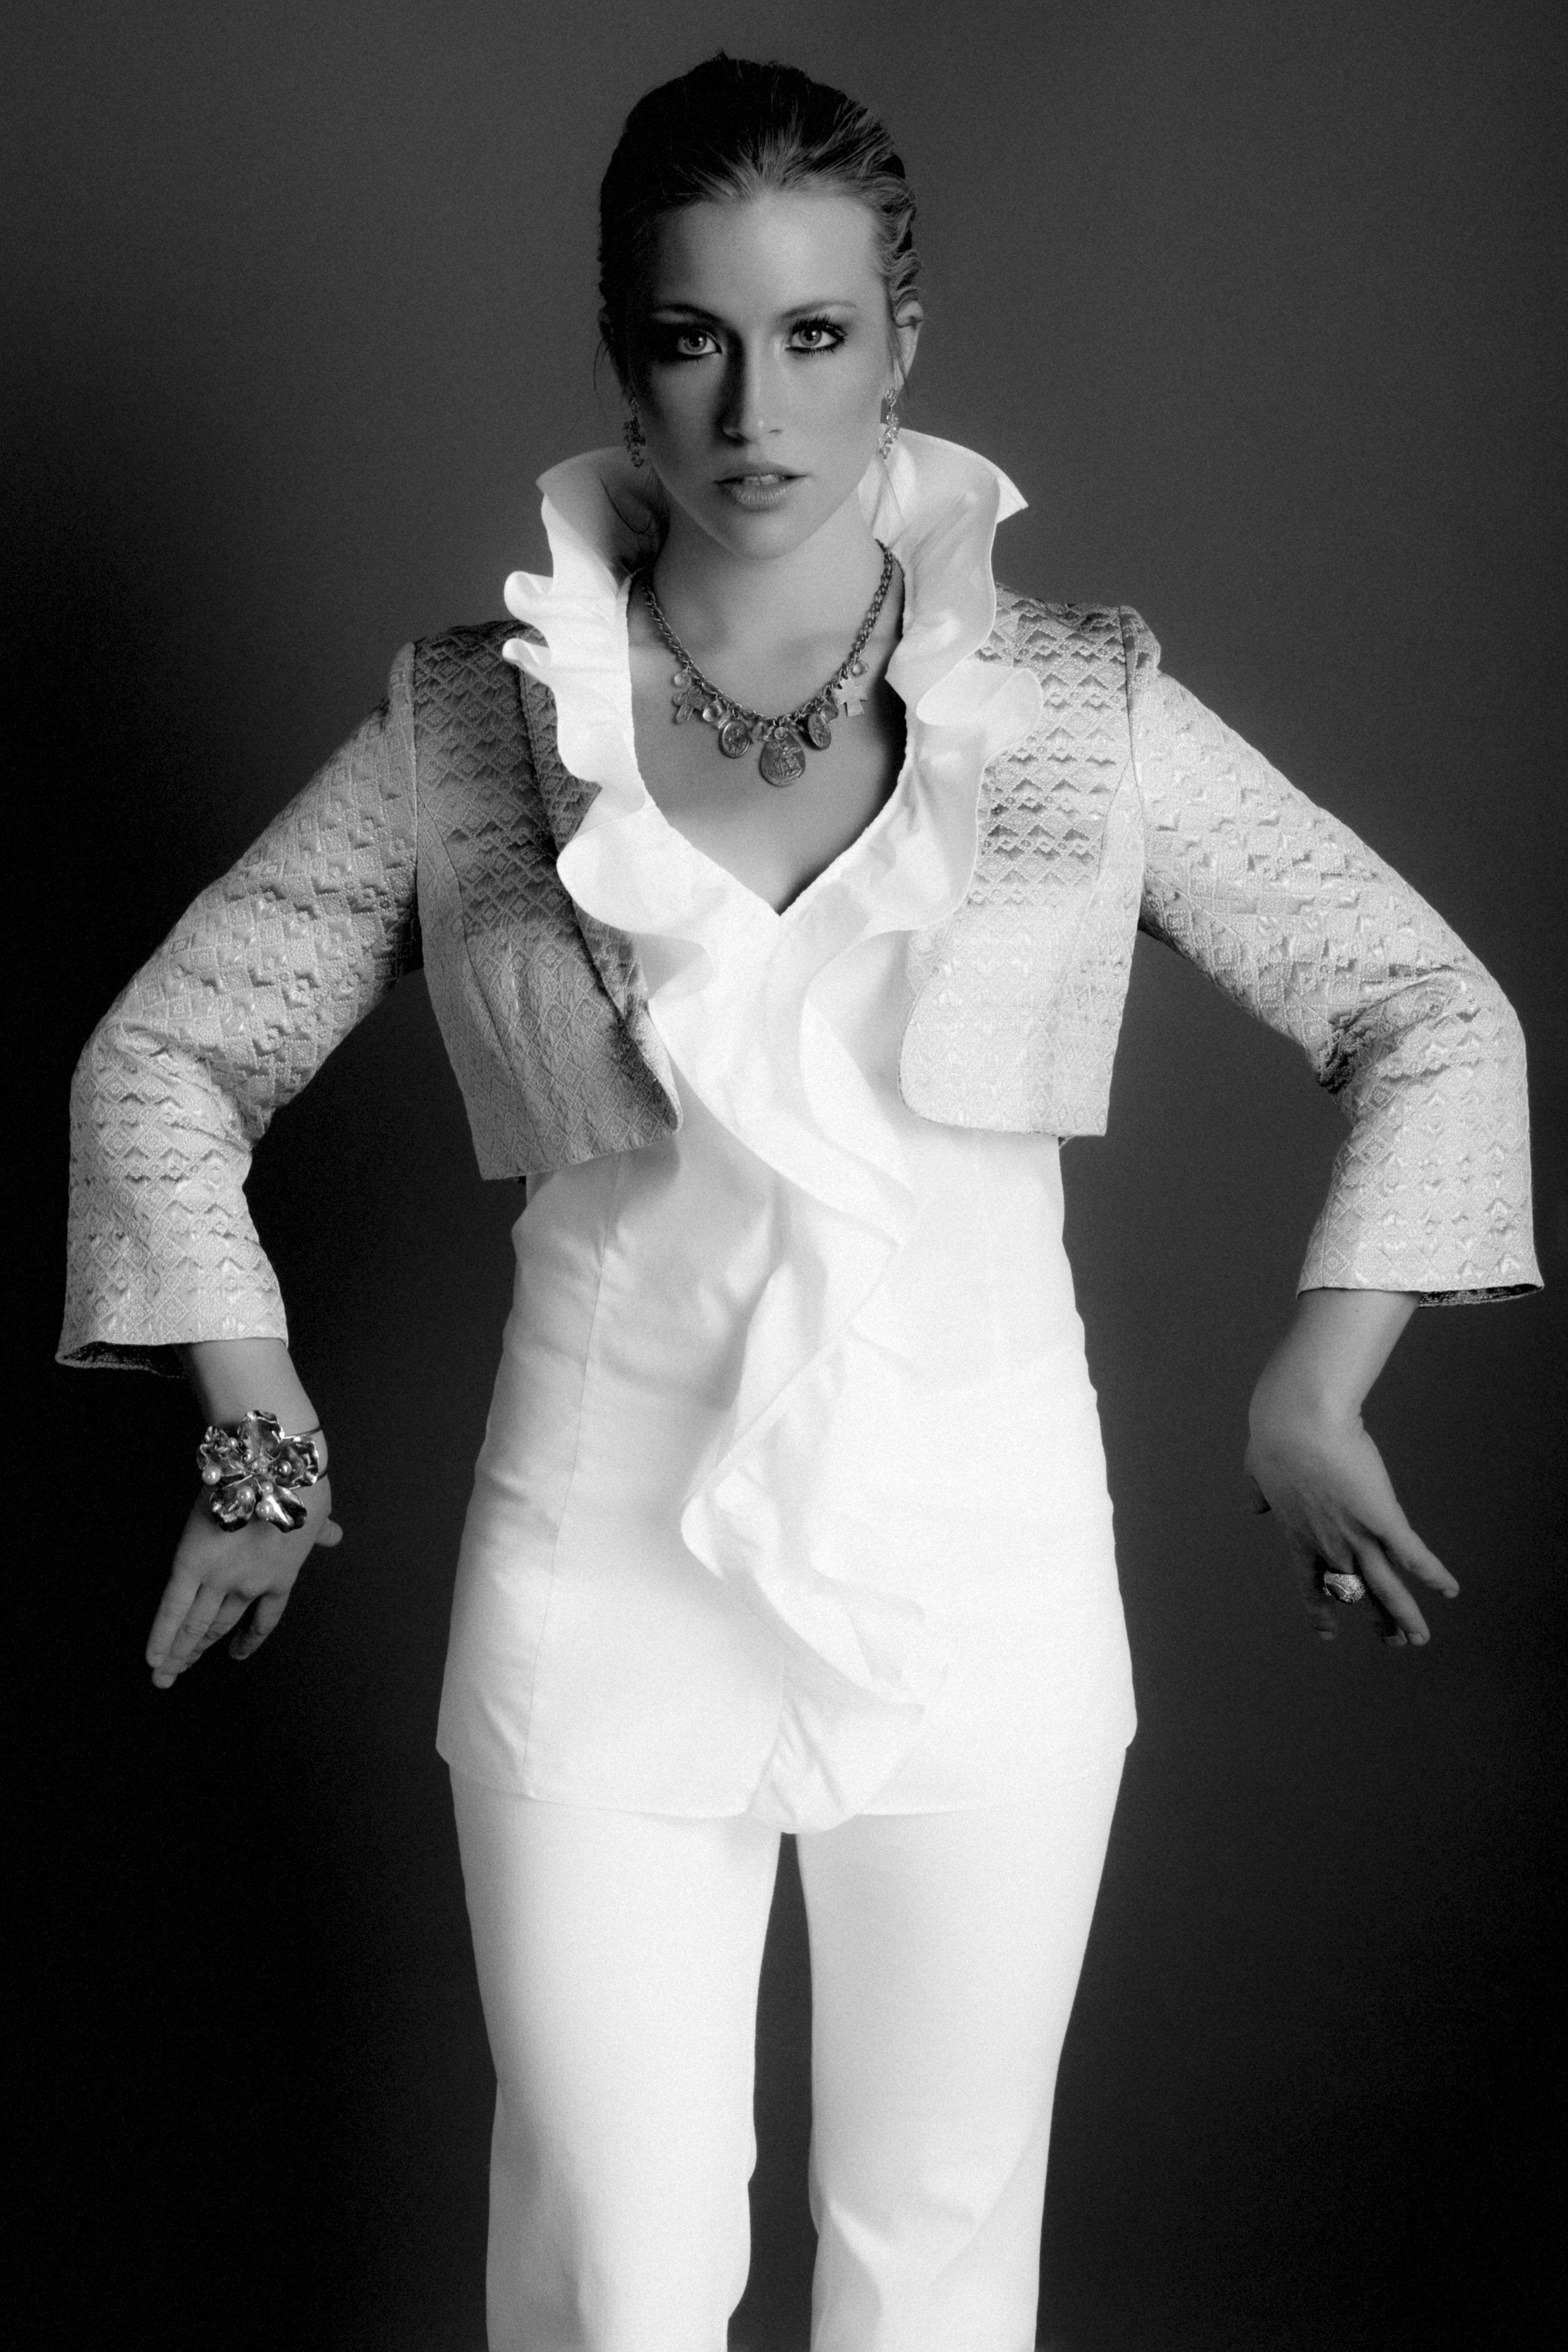 Elan - (n.) Distinctive and stylish elegance; Impulsive, confidence ardor